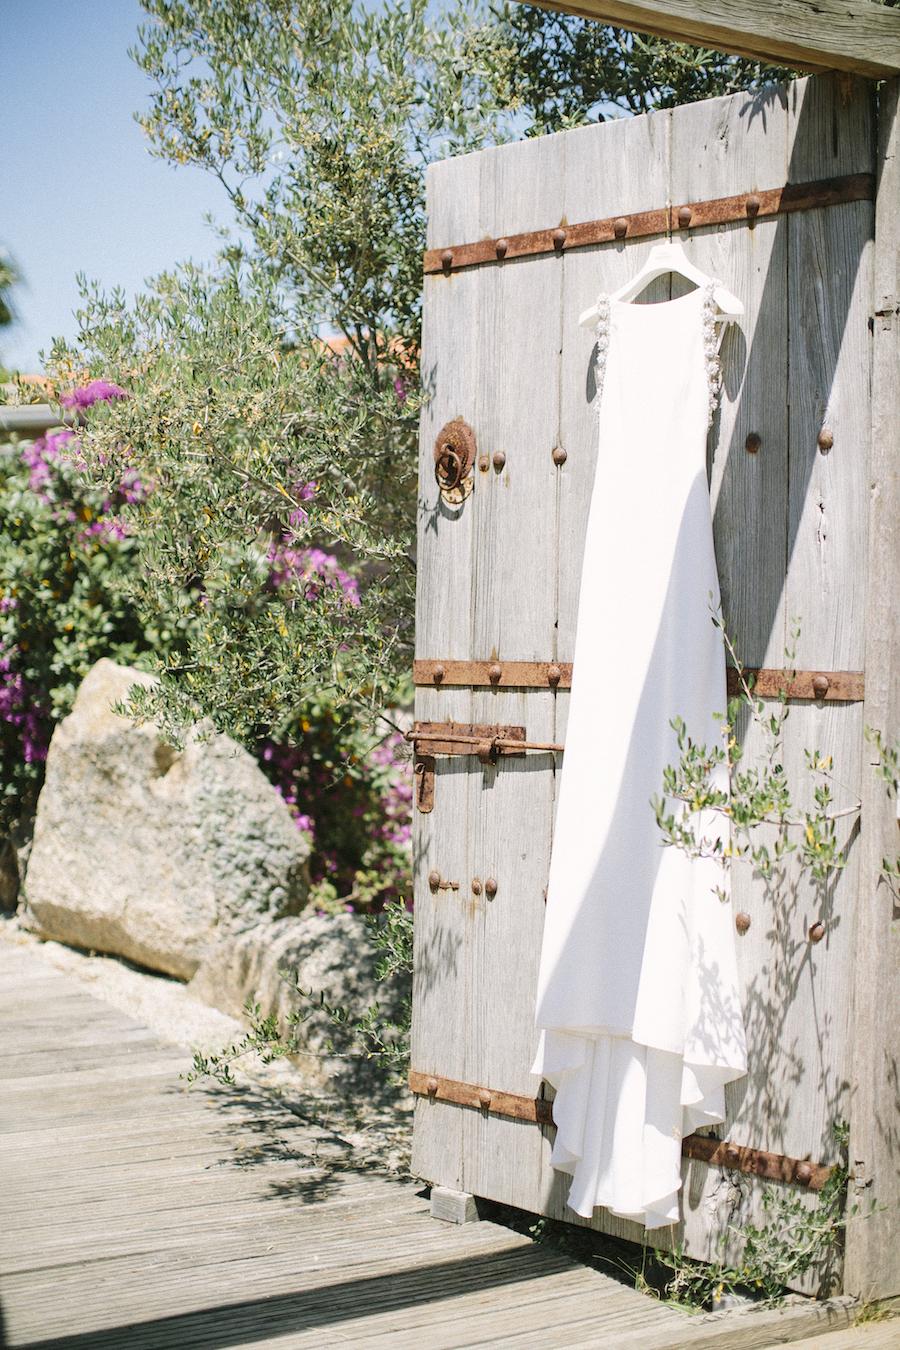 saya-photography-wedding-mariage-corse-corsica23.jpg